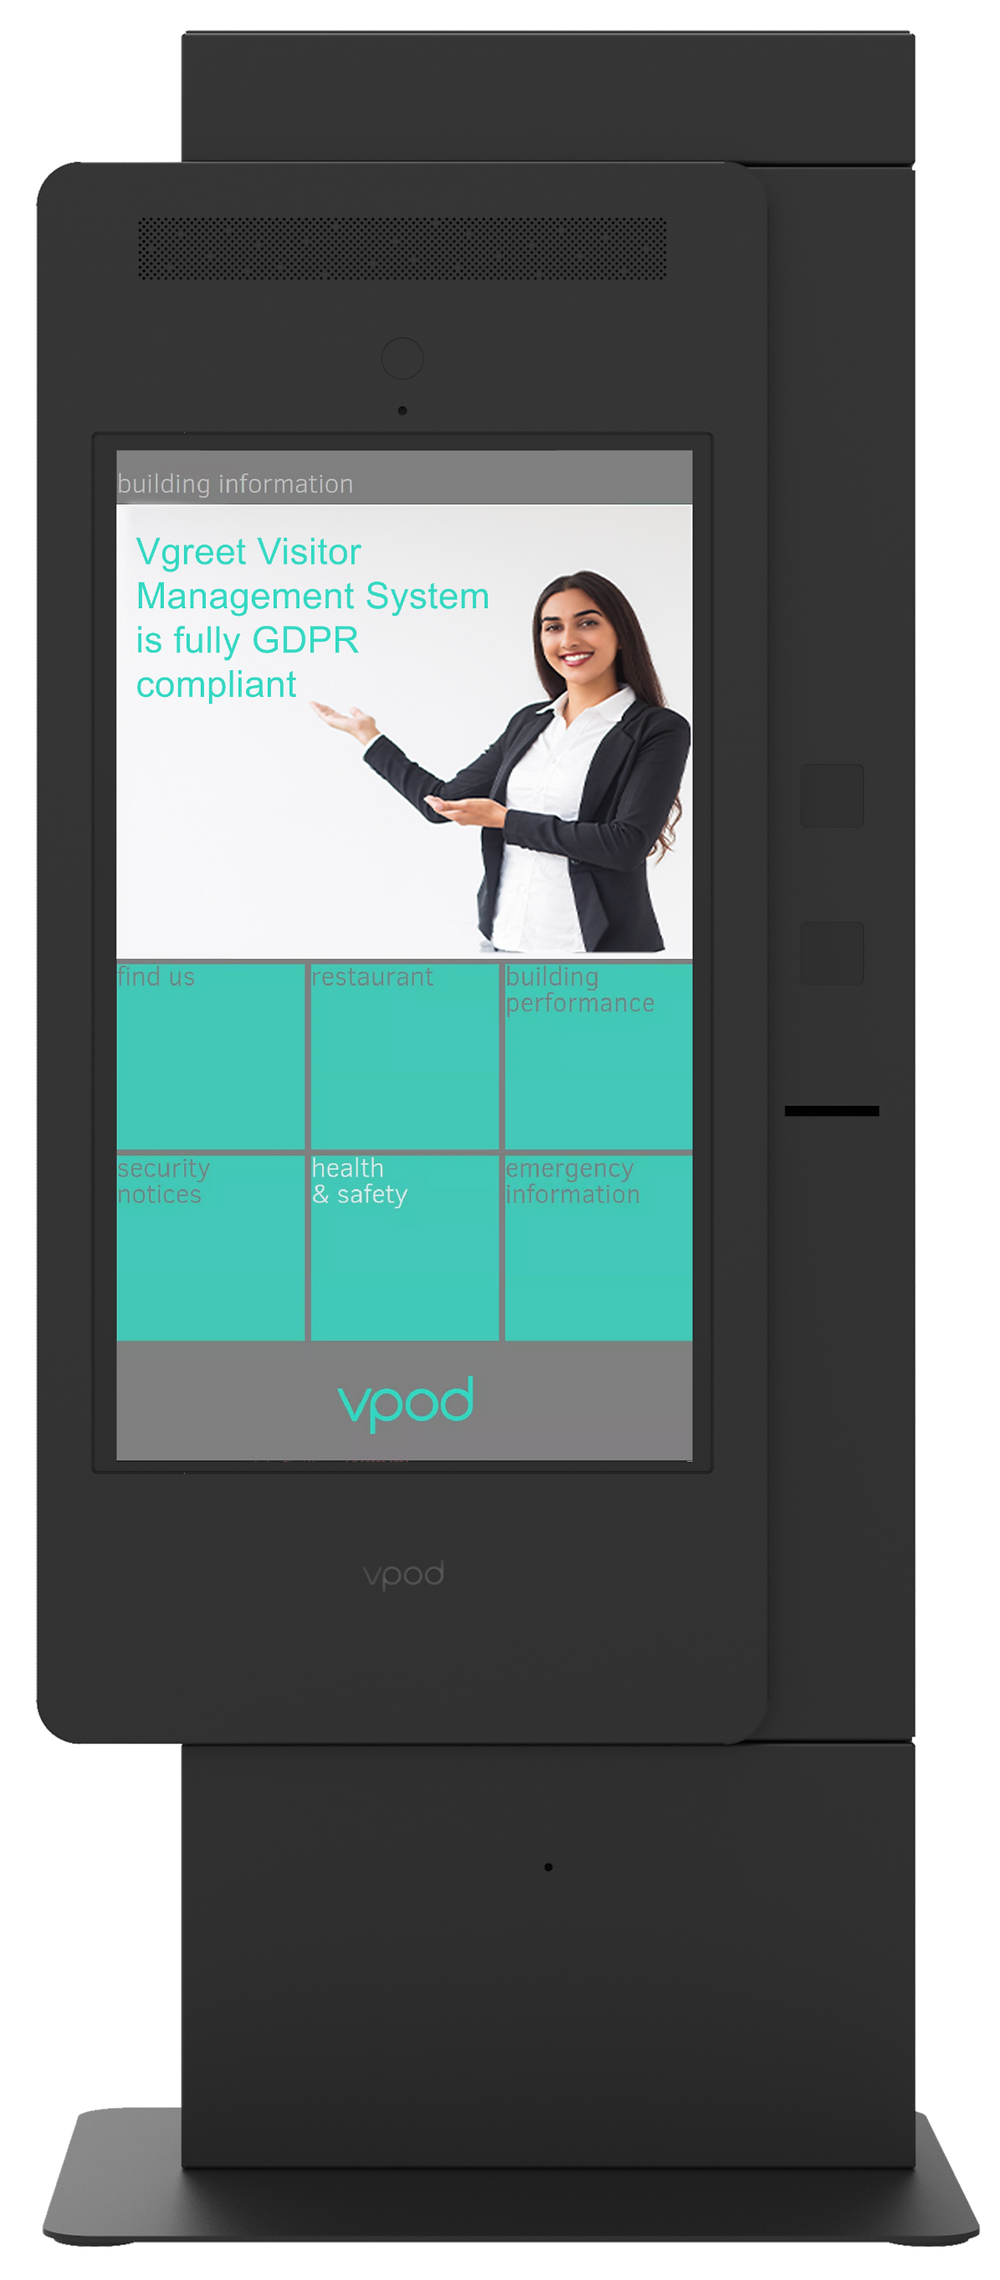 vgreet-visitor-management-gdpr-compliant